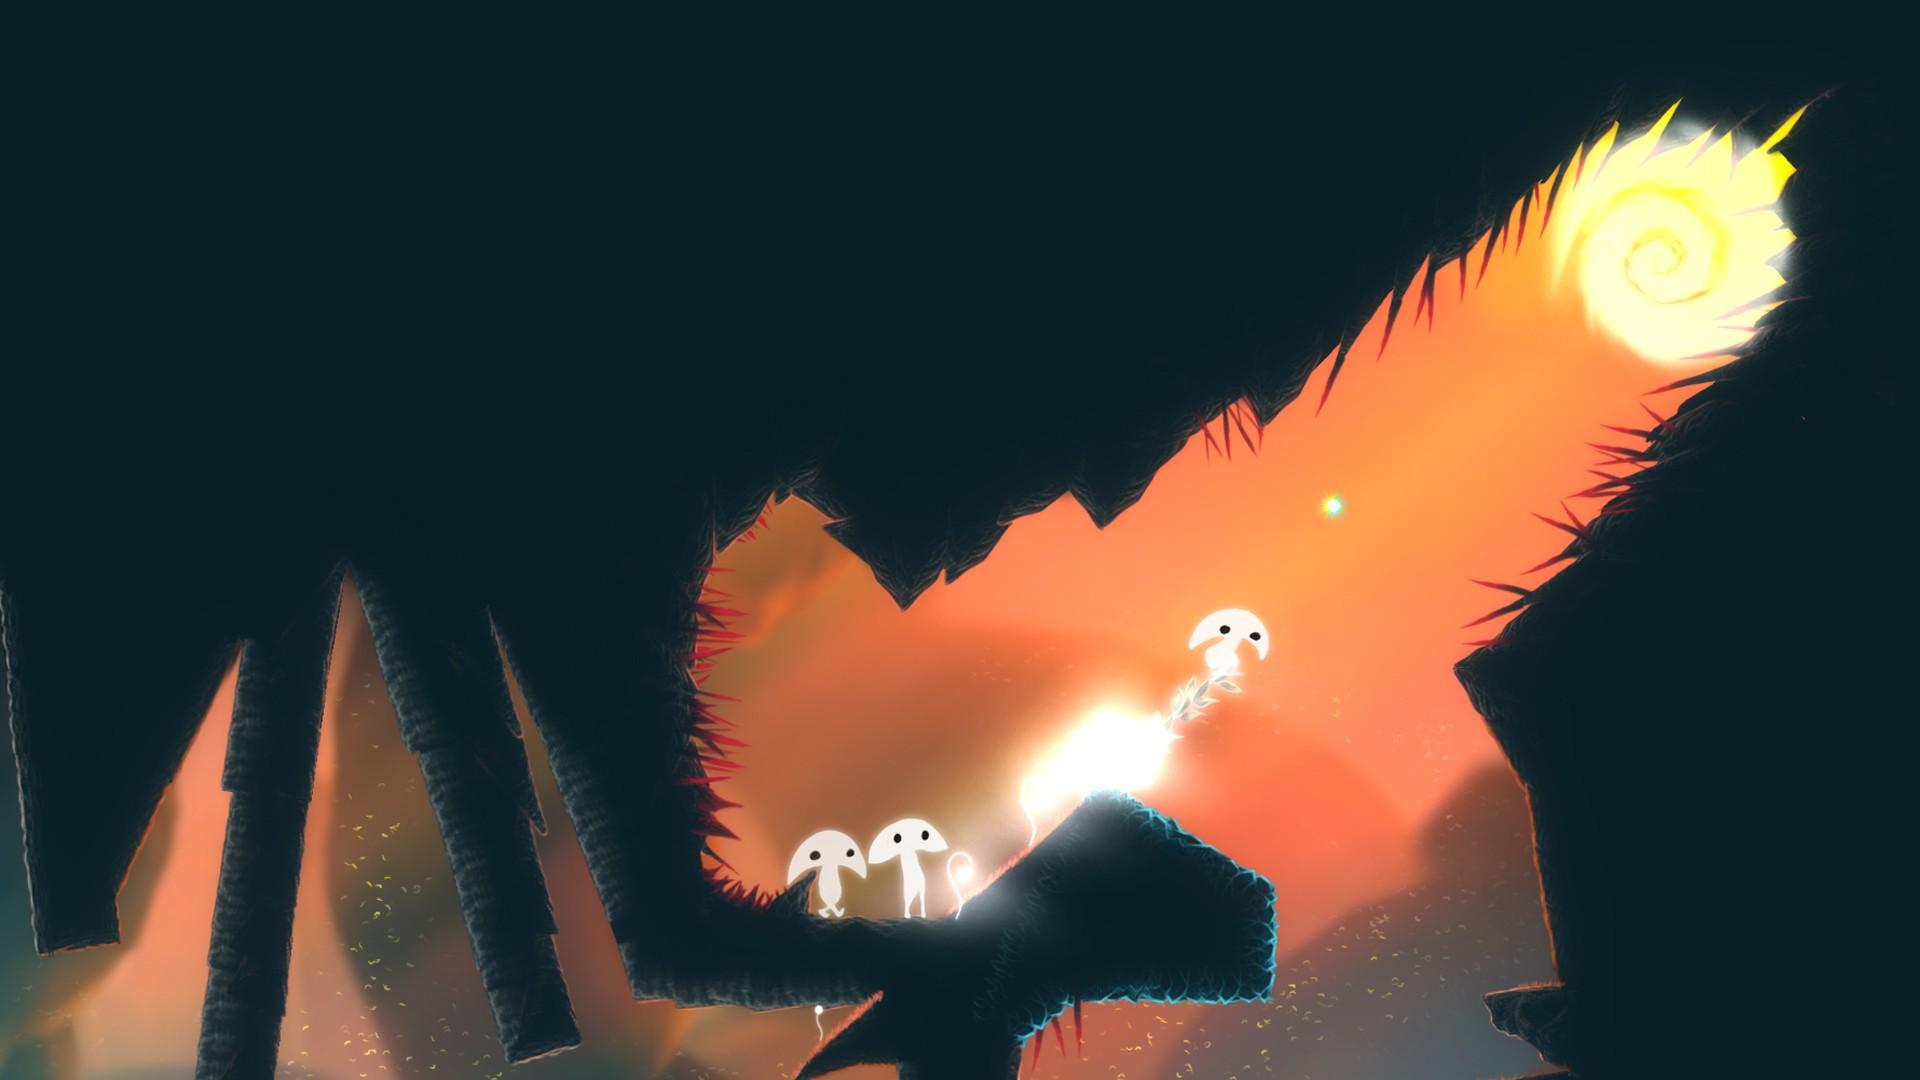 Spirits screenshot